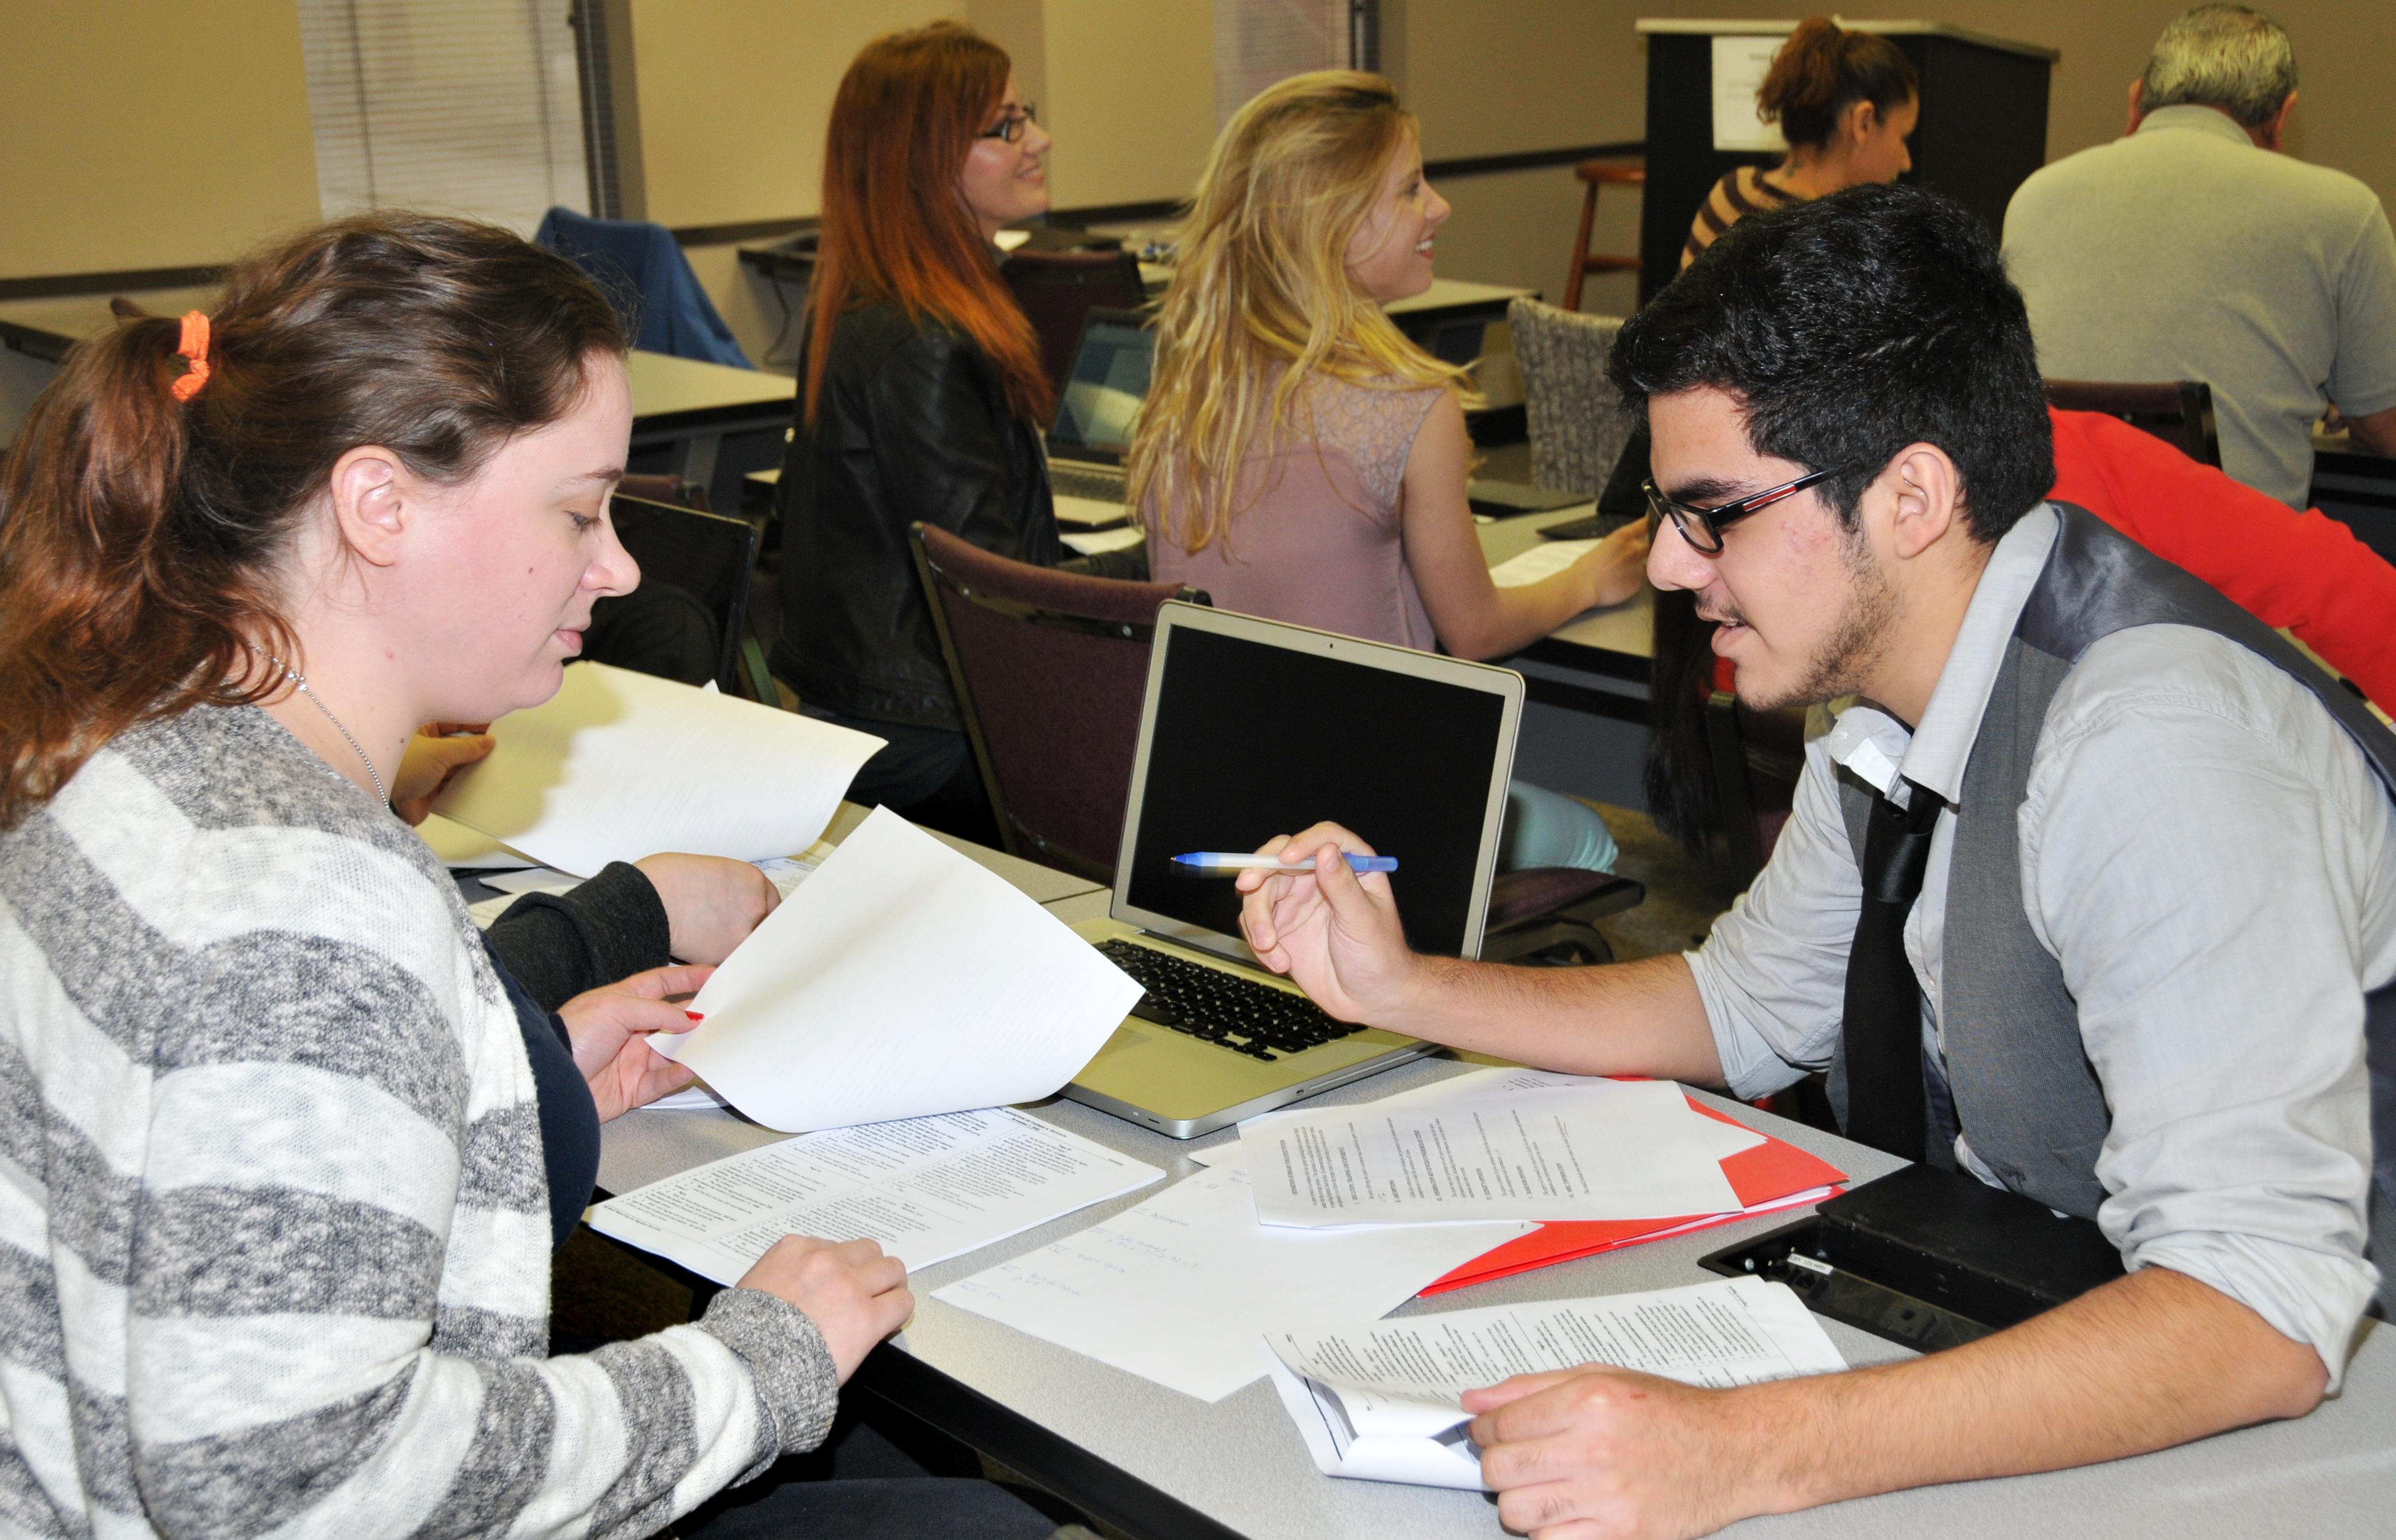 Paralegal Program Students